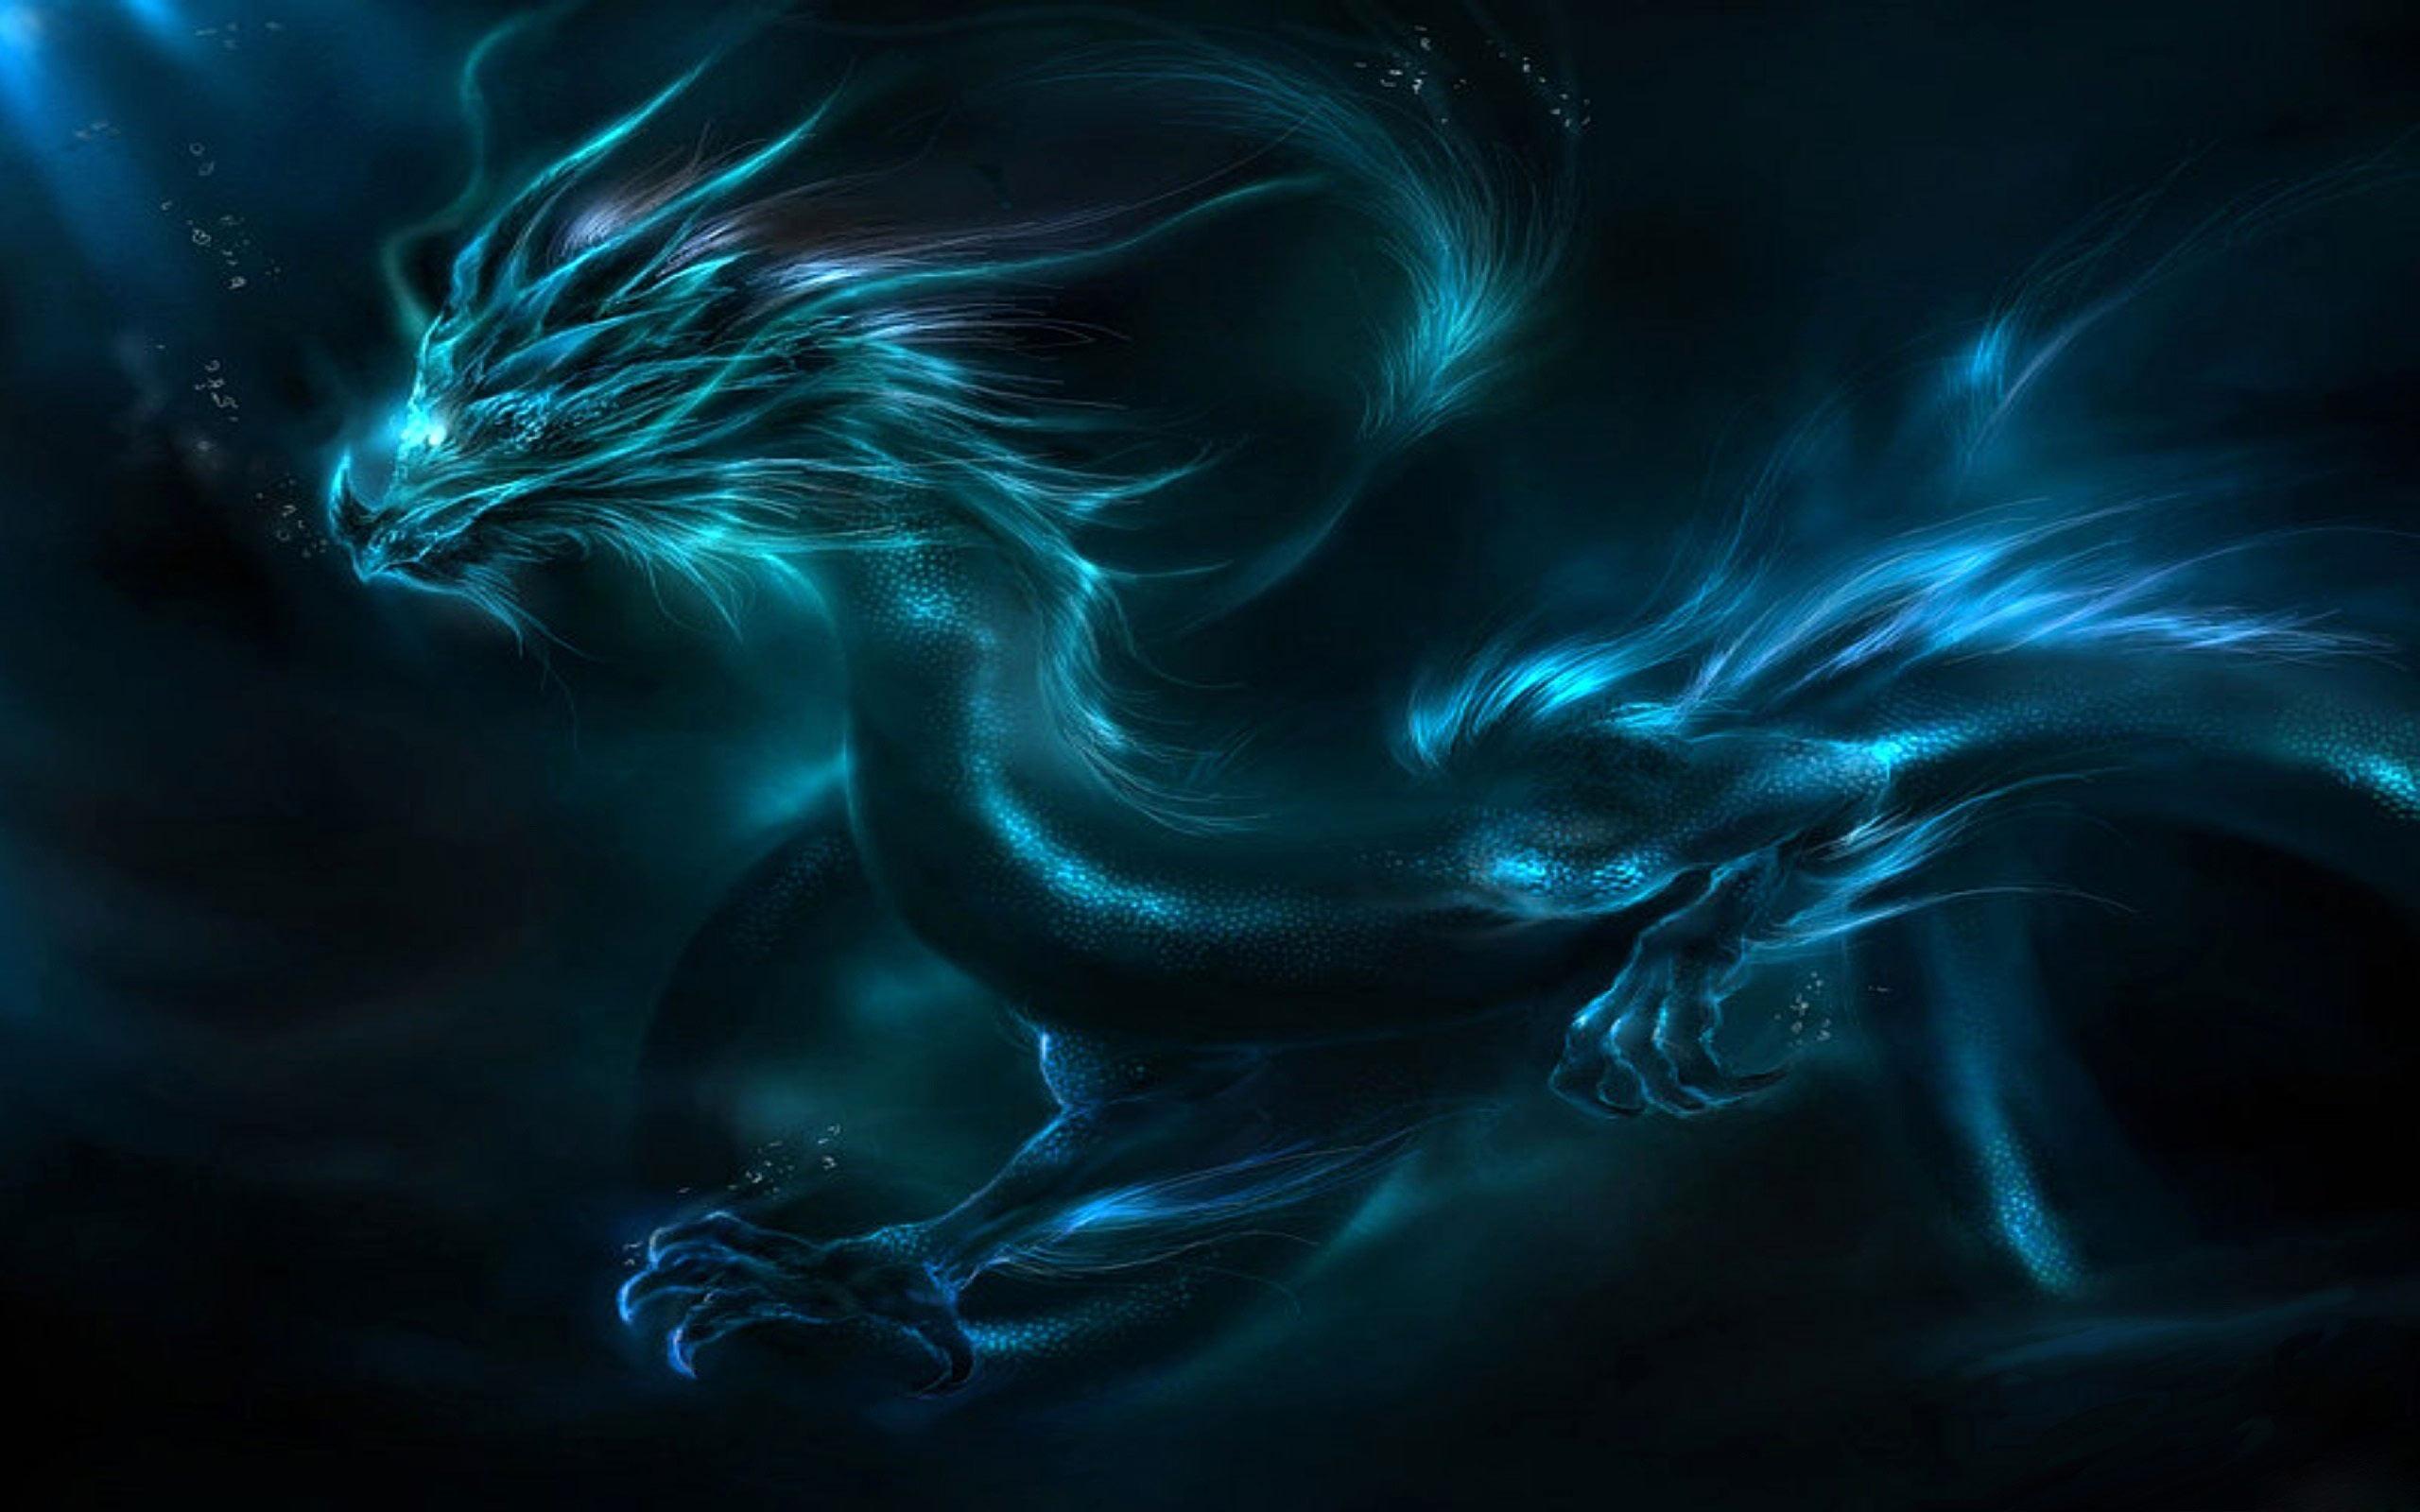 black dragon hd wallpaper With Resolutions 25601600 Pixel 2560x1600